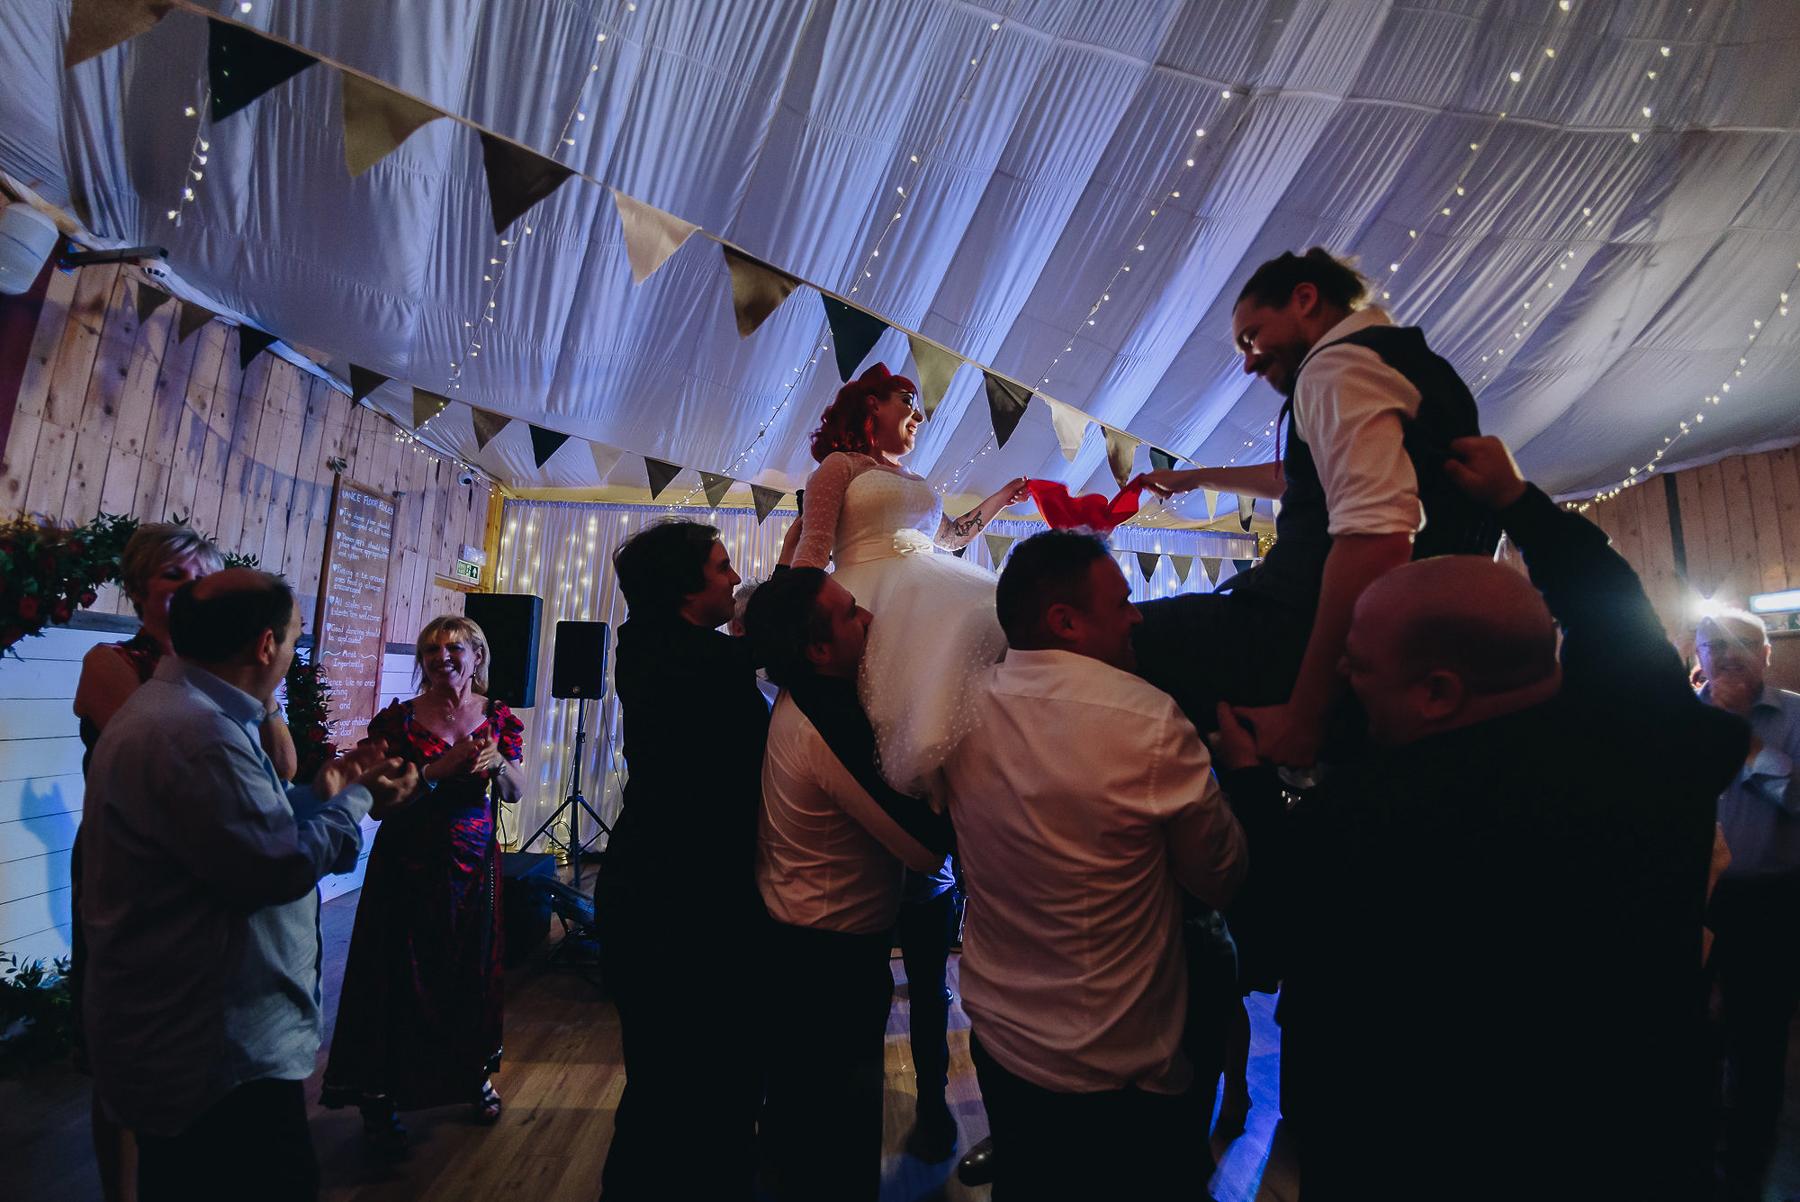 Wellbeing_Farm_Wedding_Photography_The_Pin-Up_Bride_Lara_Shaun-174.jpg